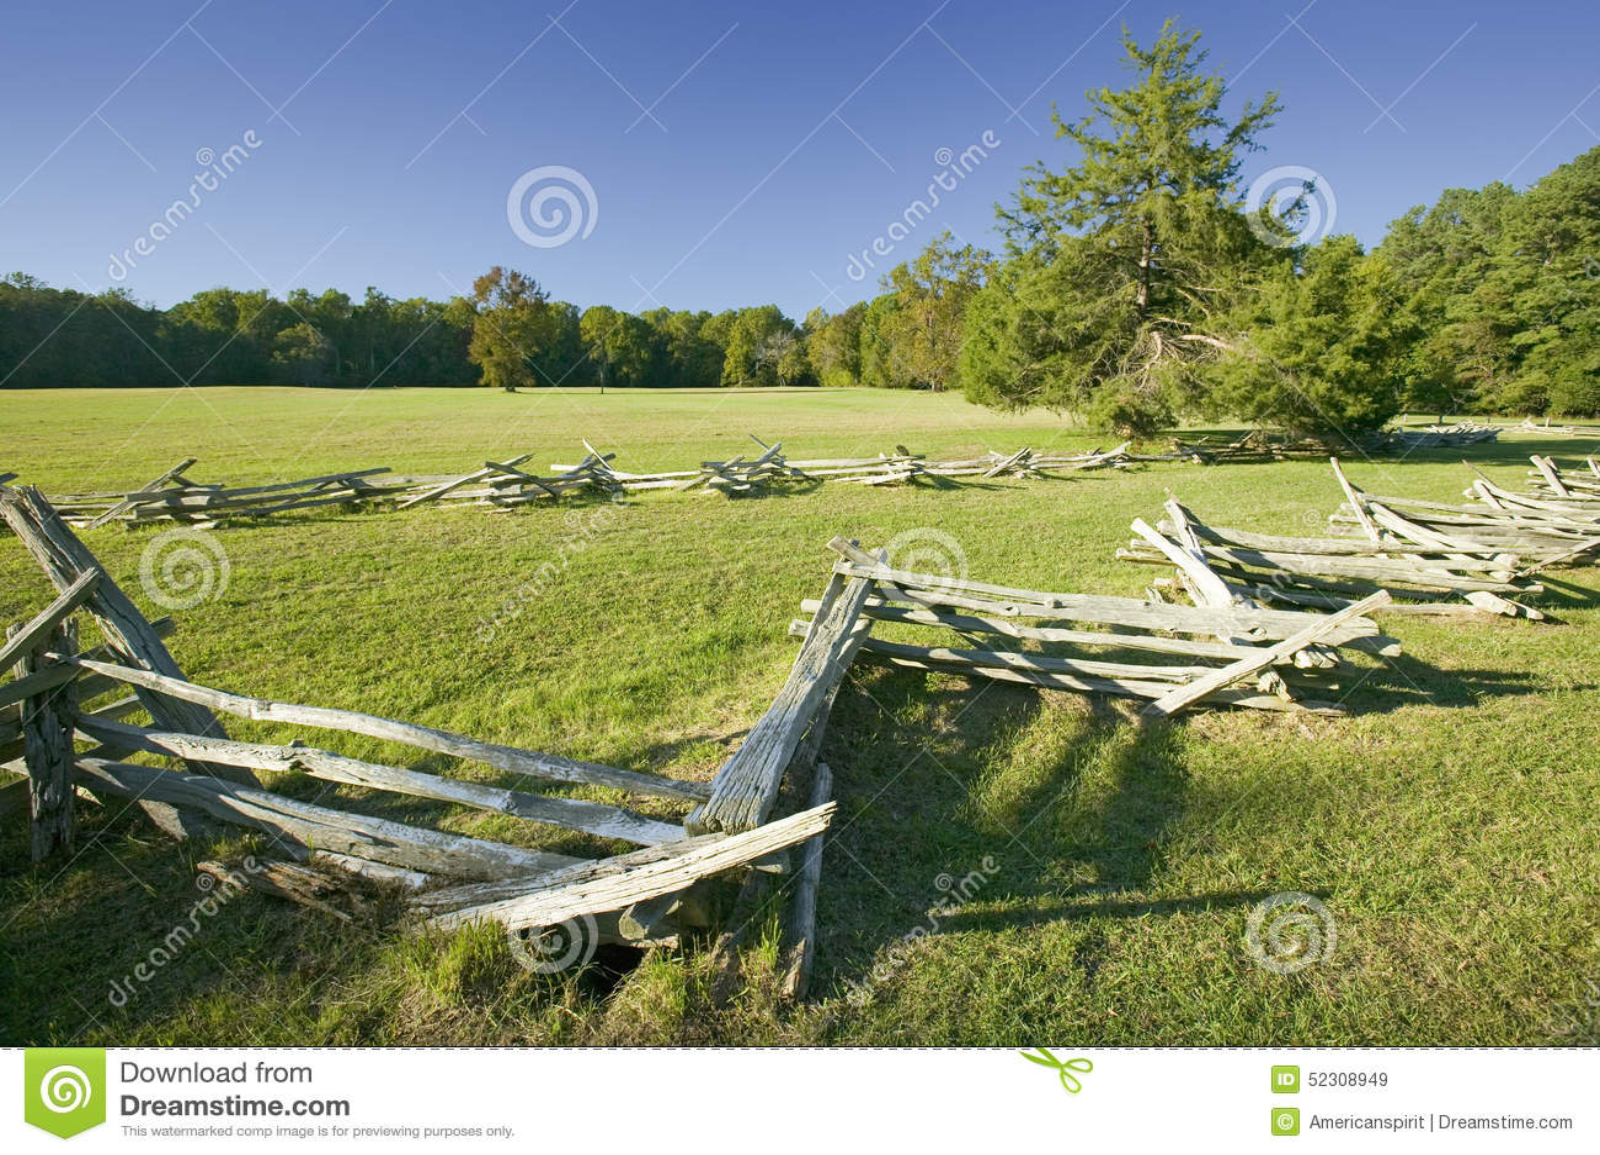 Renda o campo, onde Lord Cornwallis se rendeu ao general George Washington que termina a Revolução Americana, o surrend real